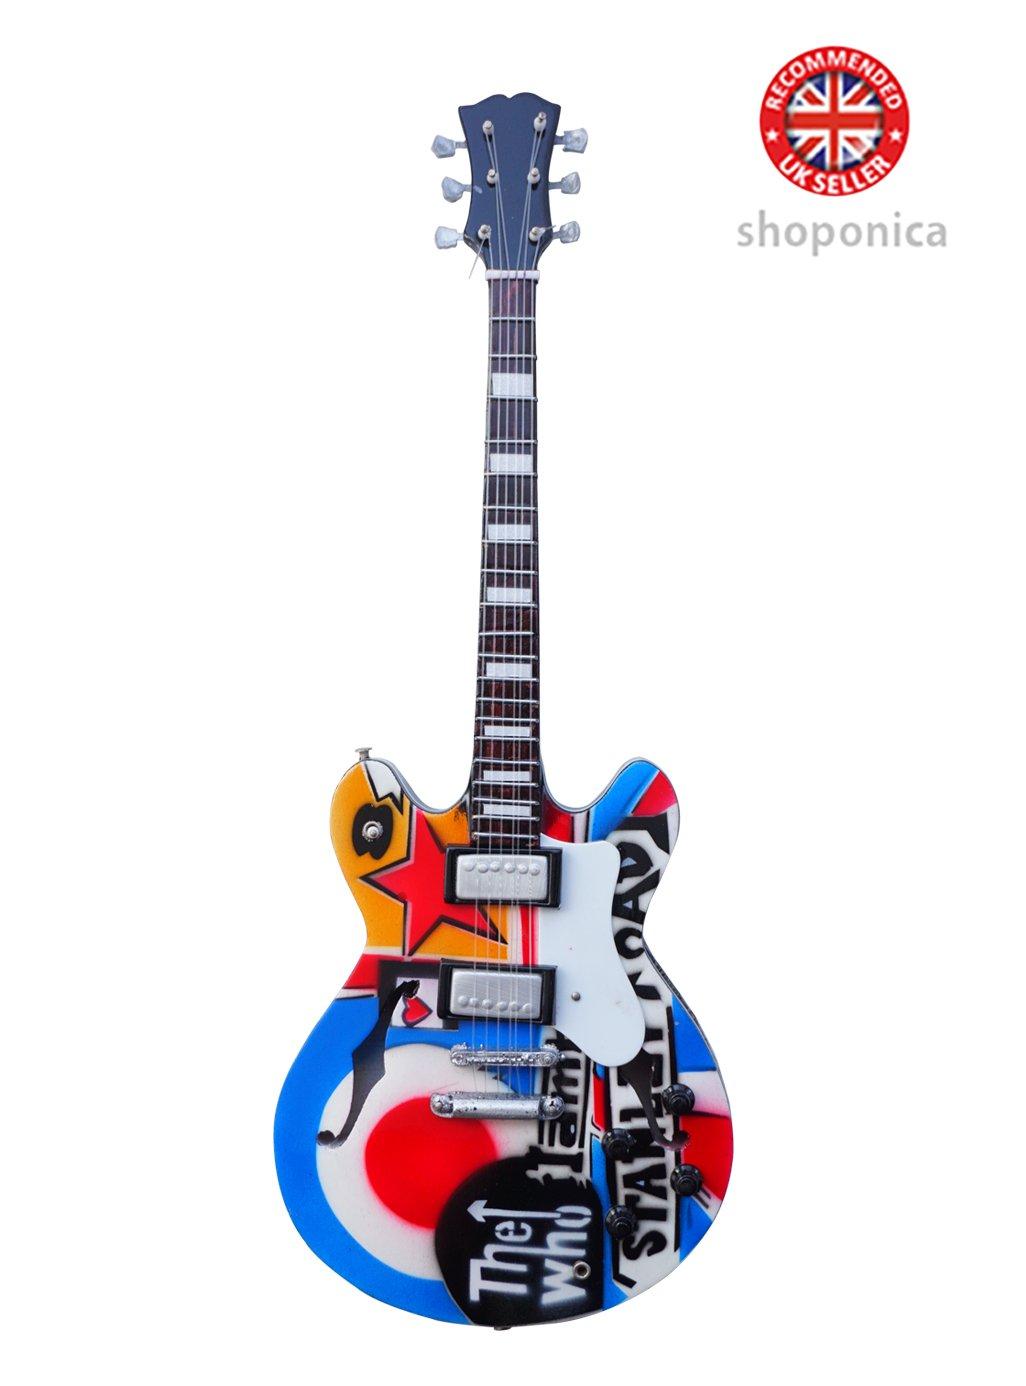 The Who–Tribute Holz Miniatur-Gitarre Nachbildung (shoponica) ML